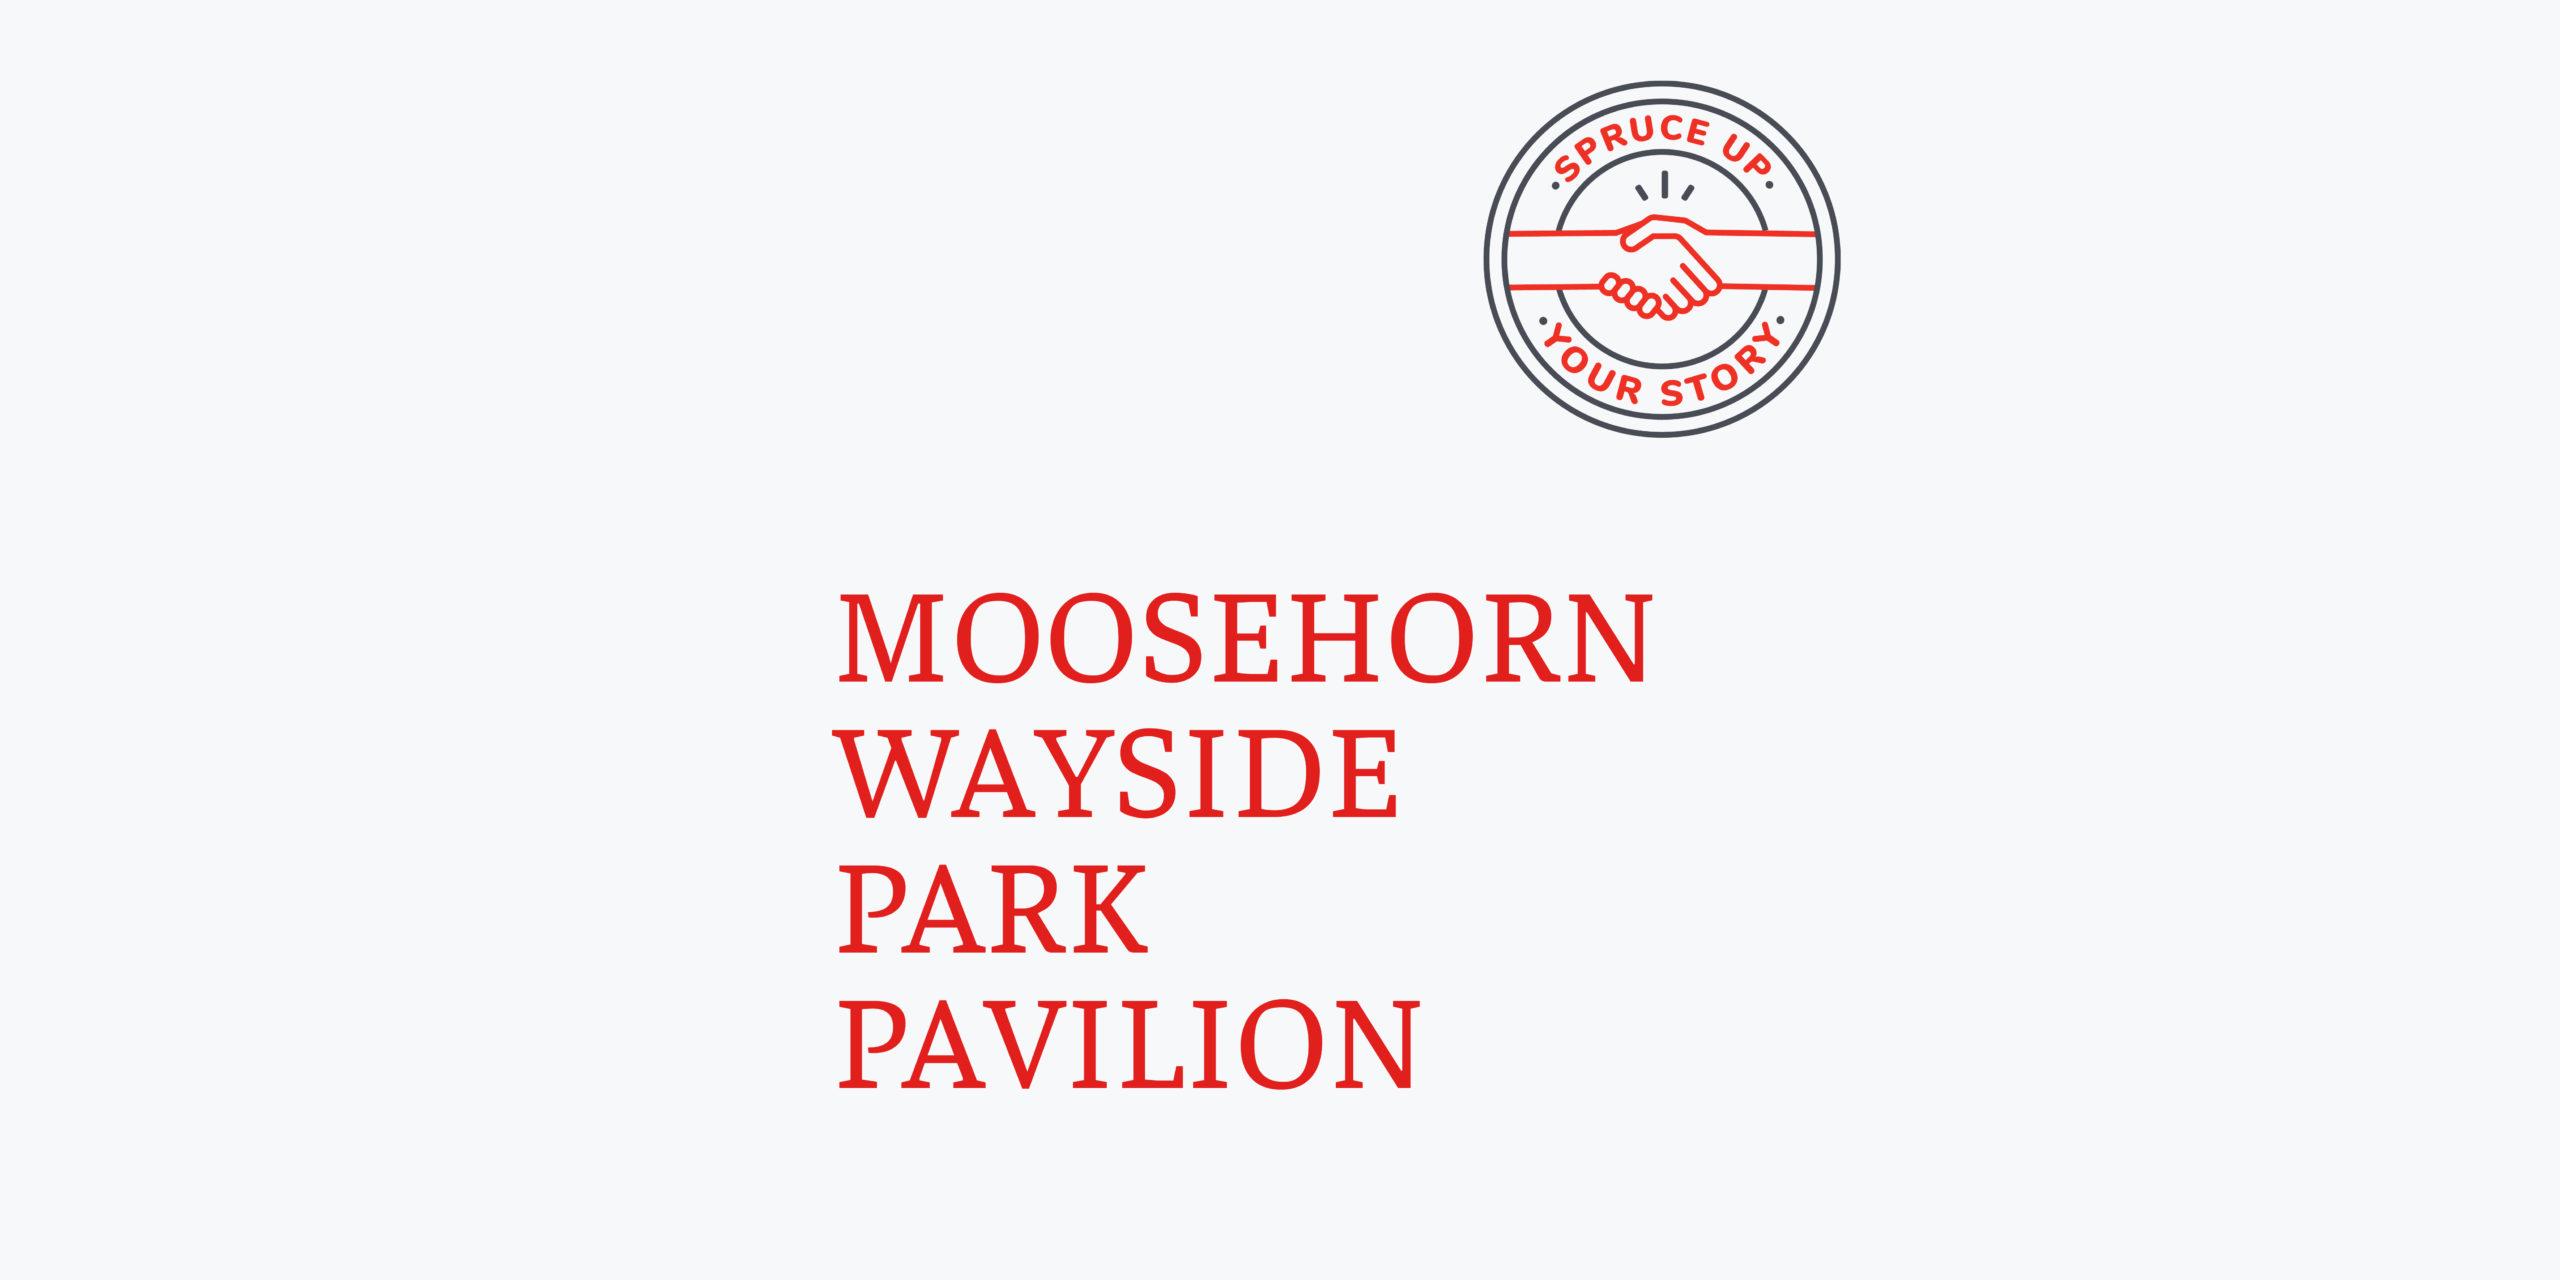 Moosehorn Wayside Park Pavilion